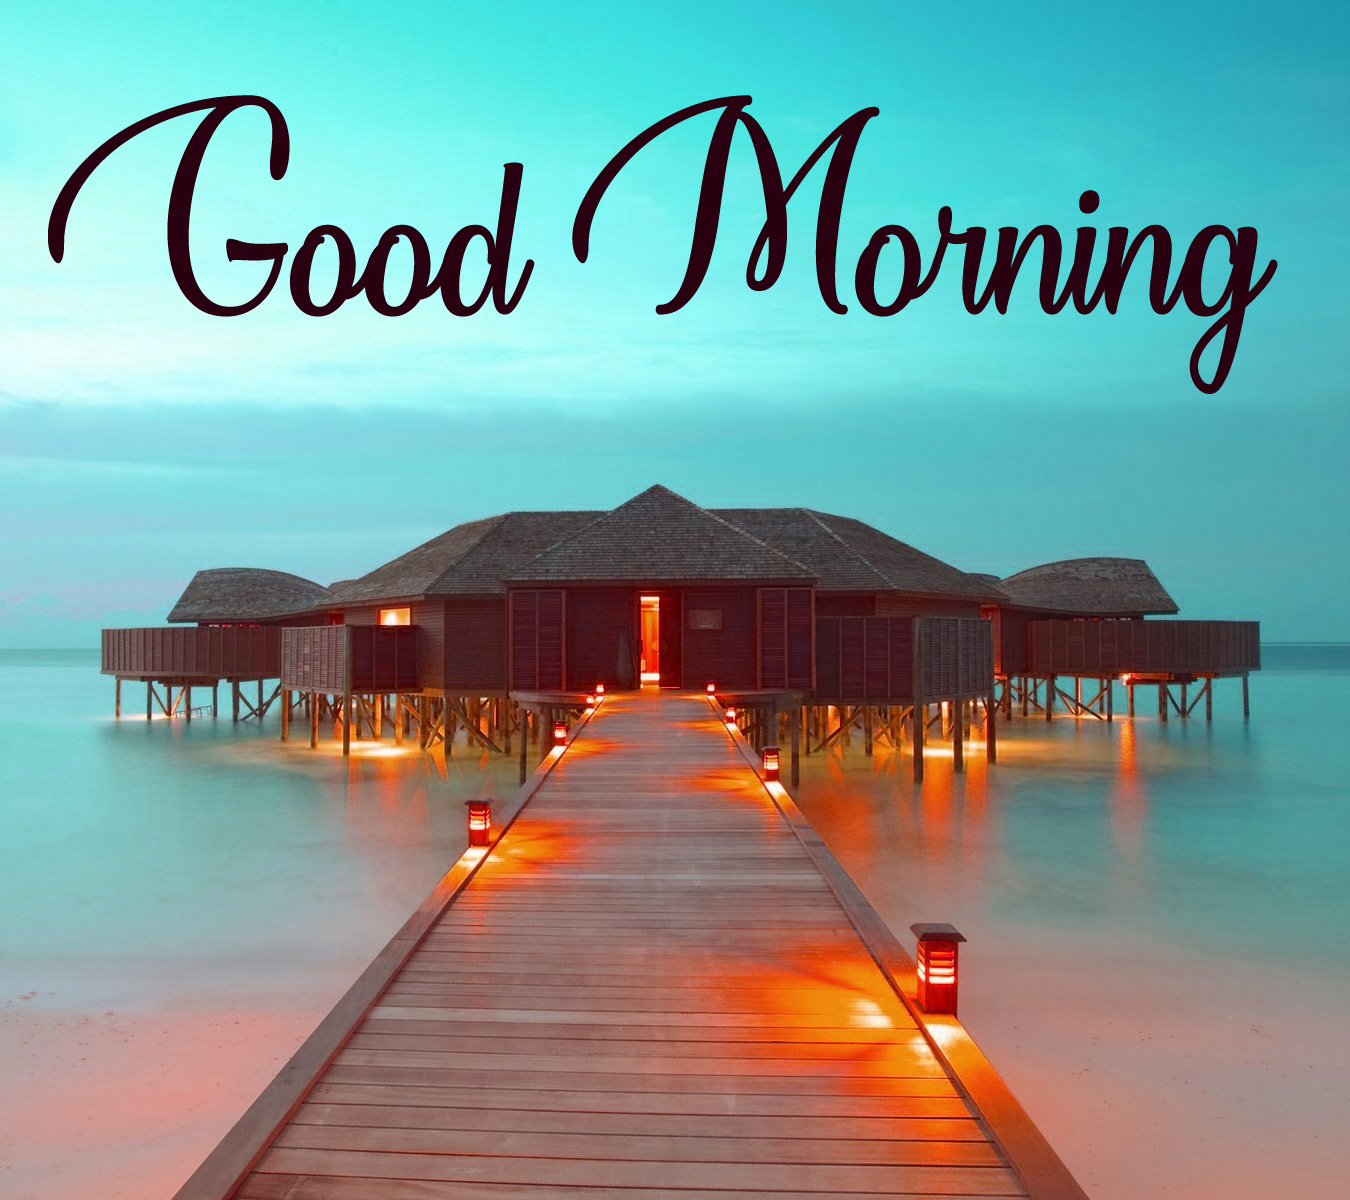 world good morning Images 8